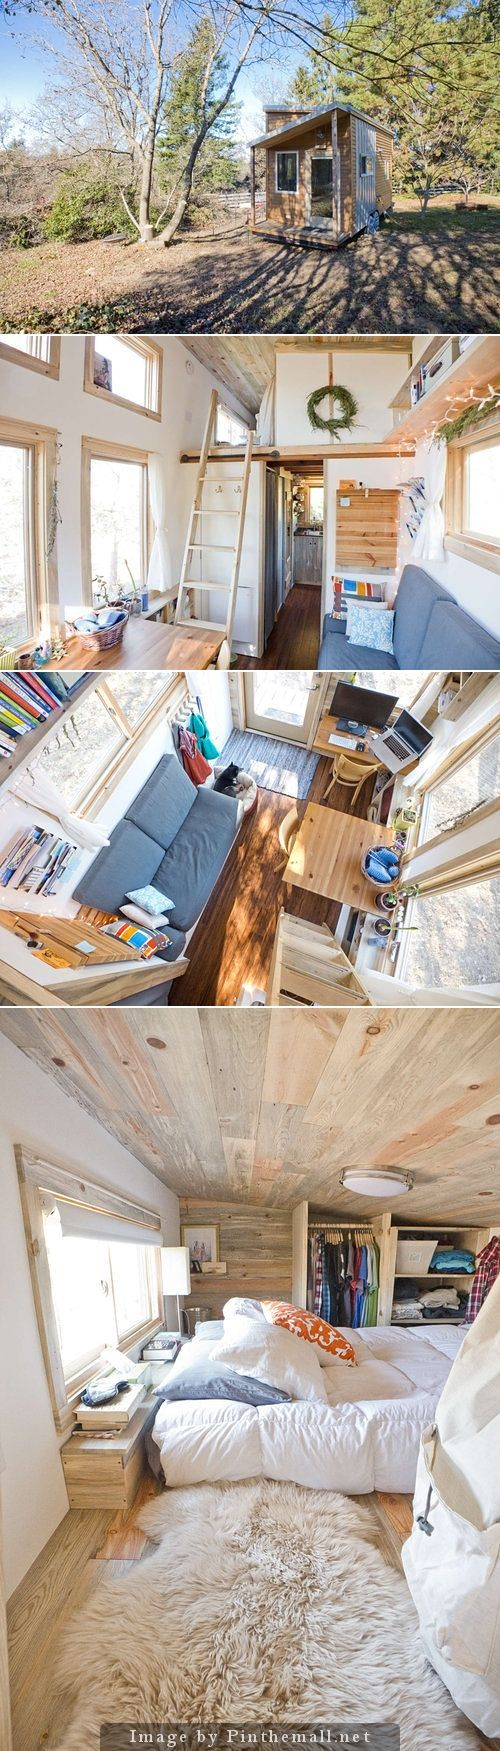 eco tiny house 160sf   - created via http://pinthemall.net